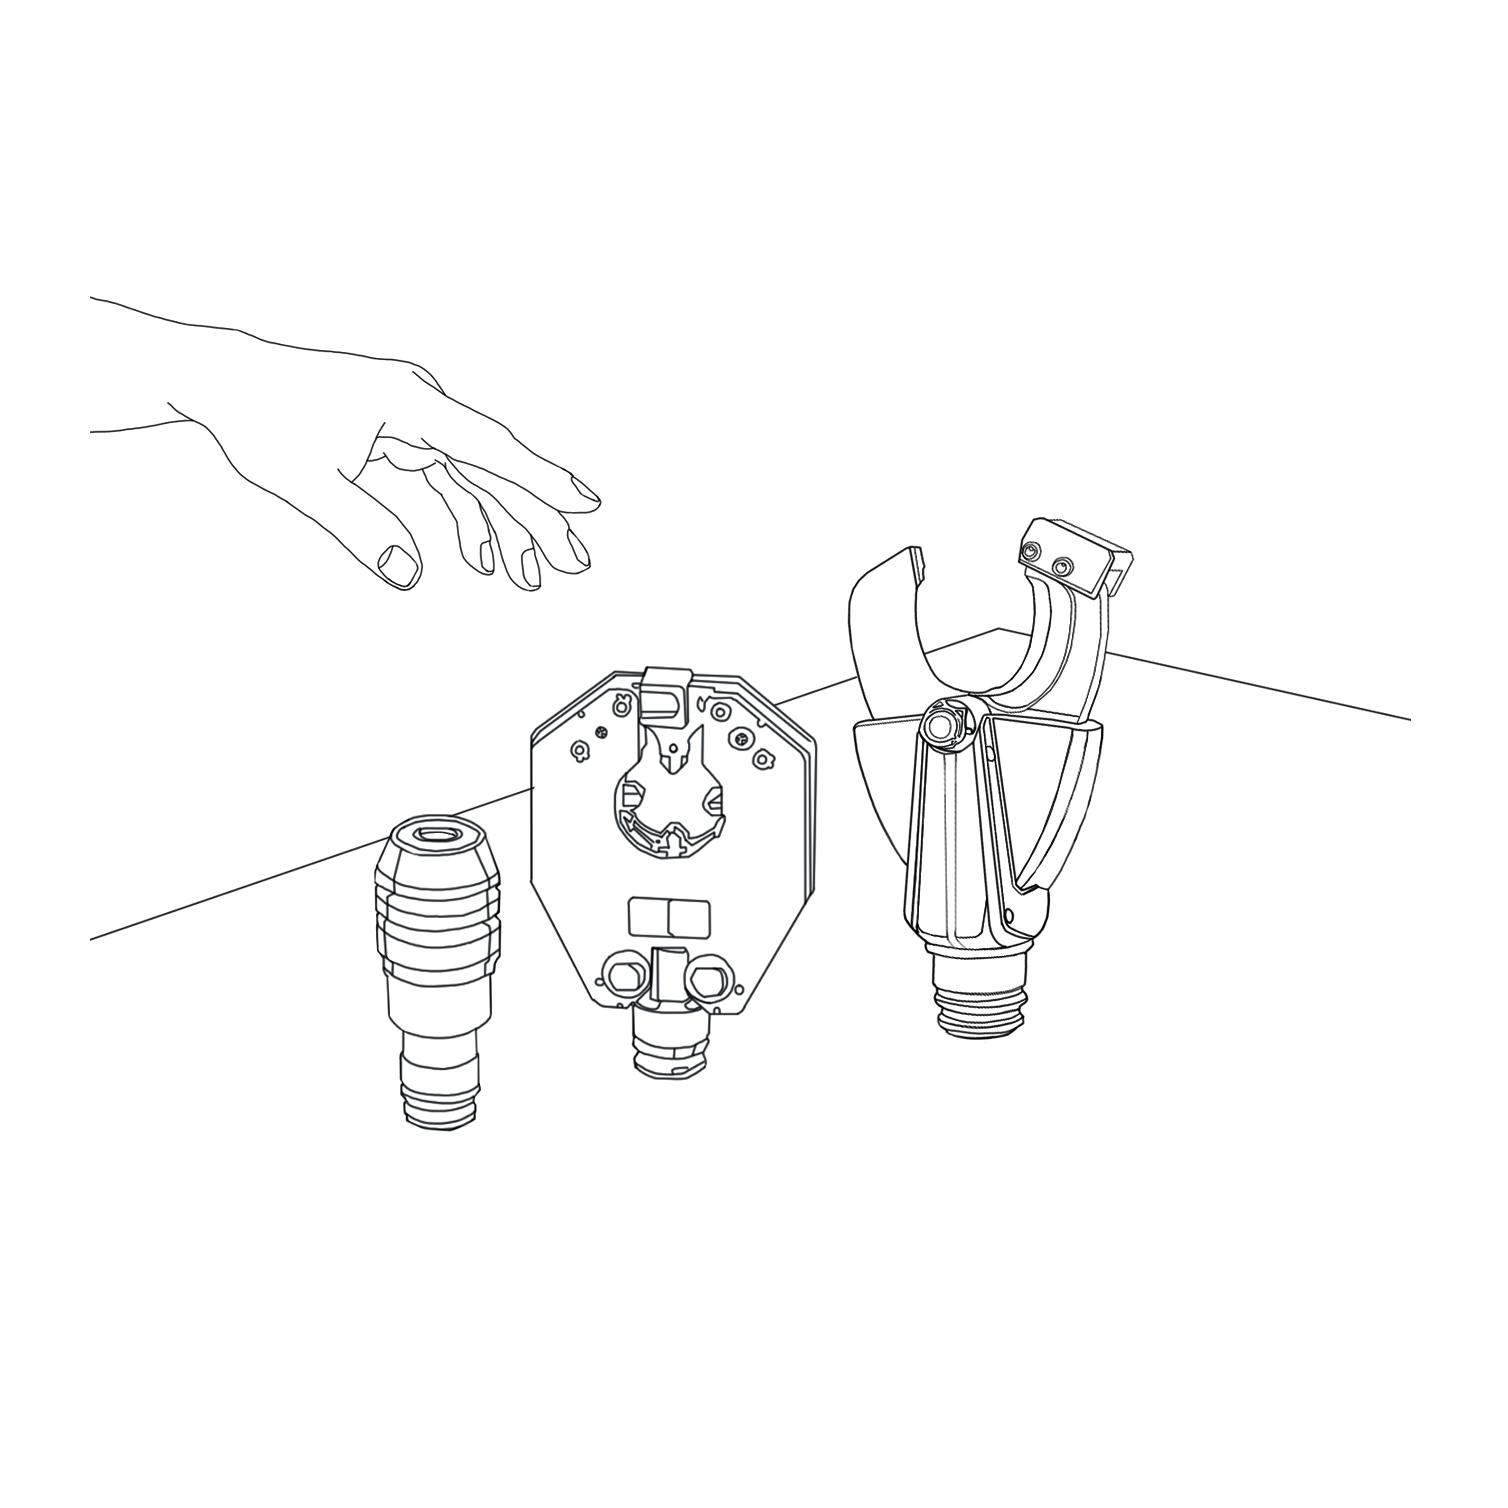 4268-01-Electrical QCS Illustrations_5x5_1.jpg